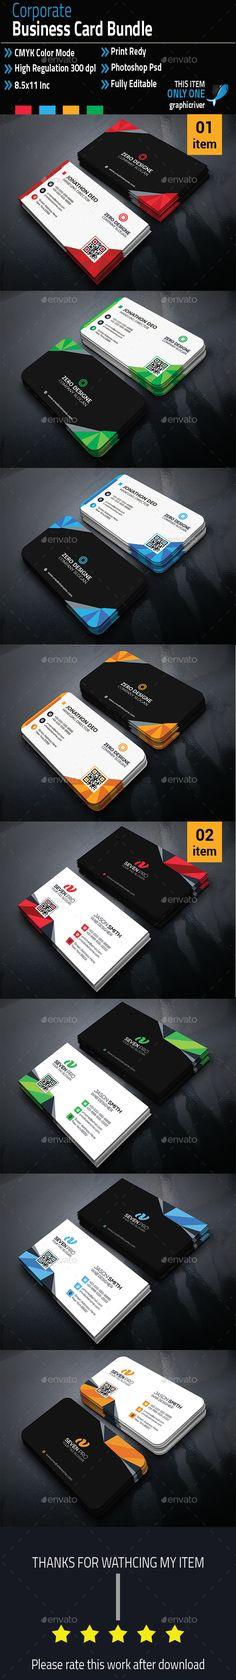 Corporate Business Card Bundle Creative Cards Print Templates